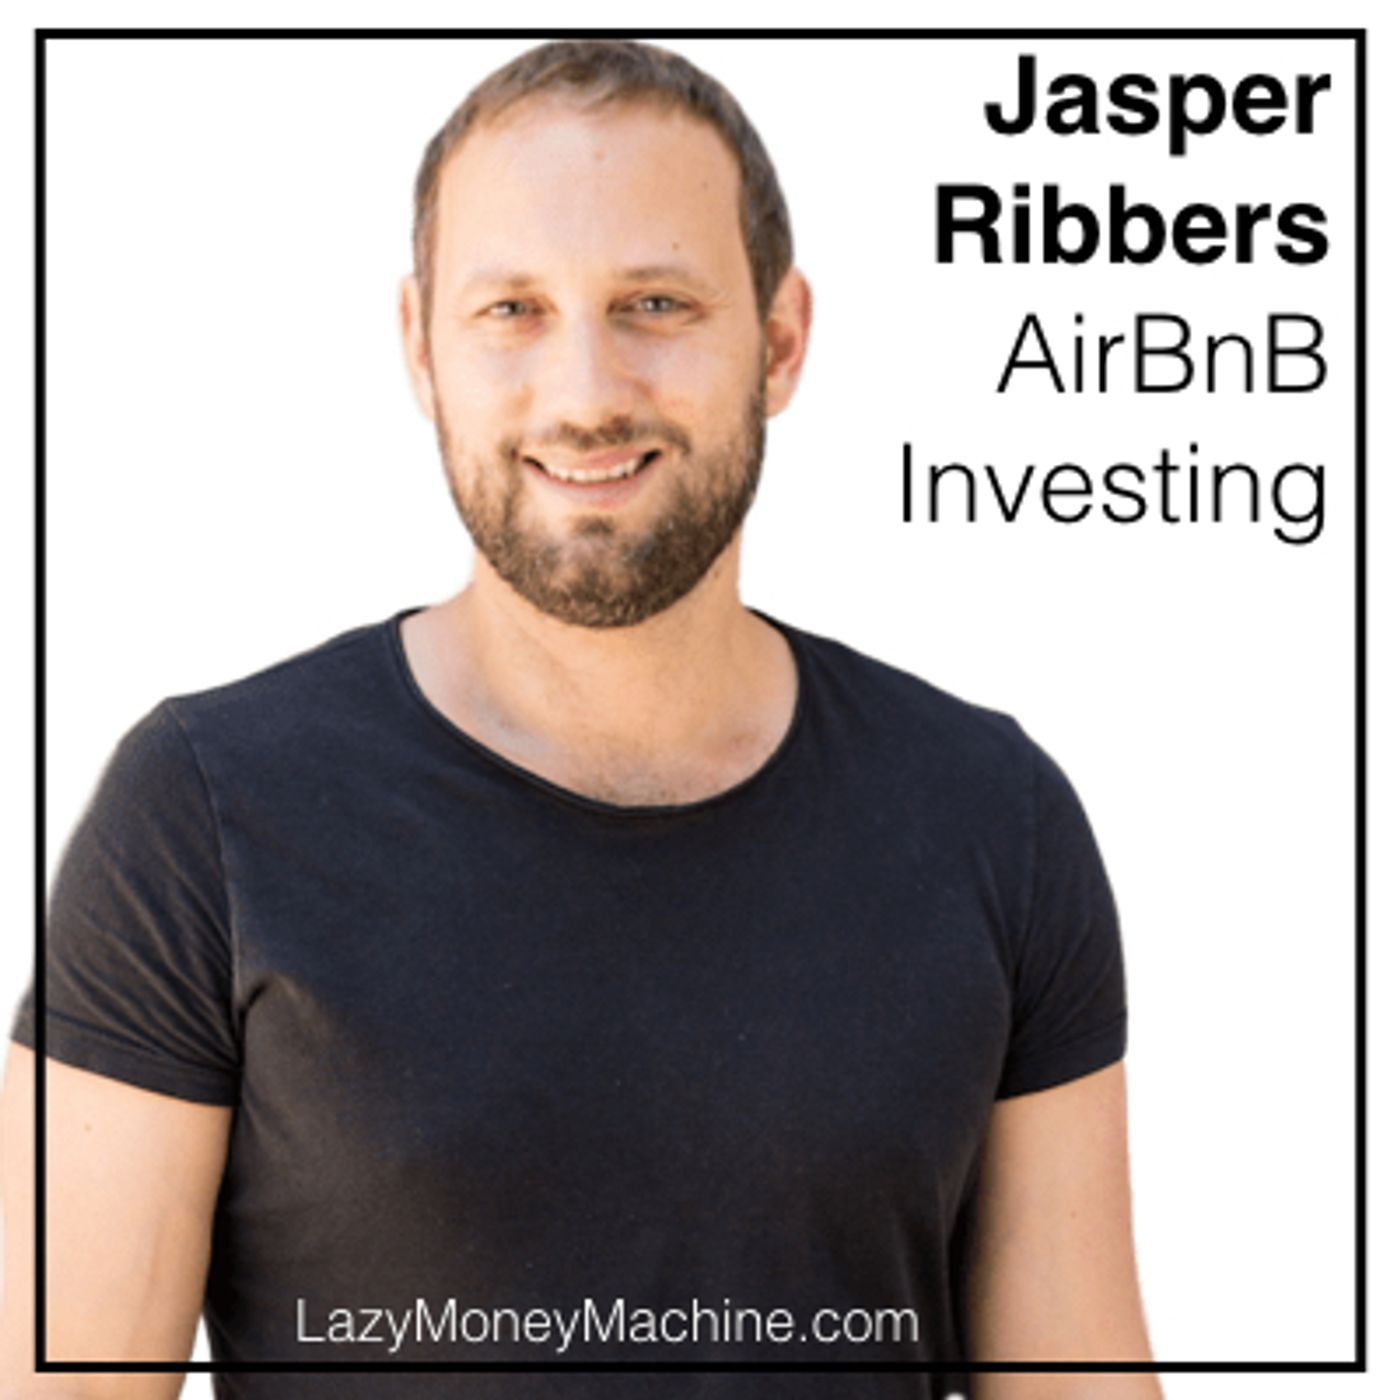 47: AirBnB Investing - Jasper Ribbers